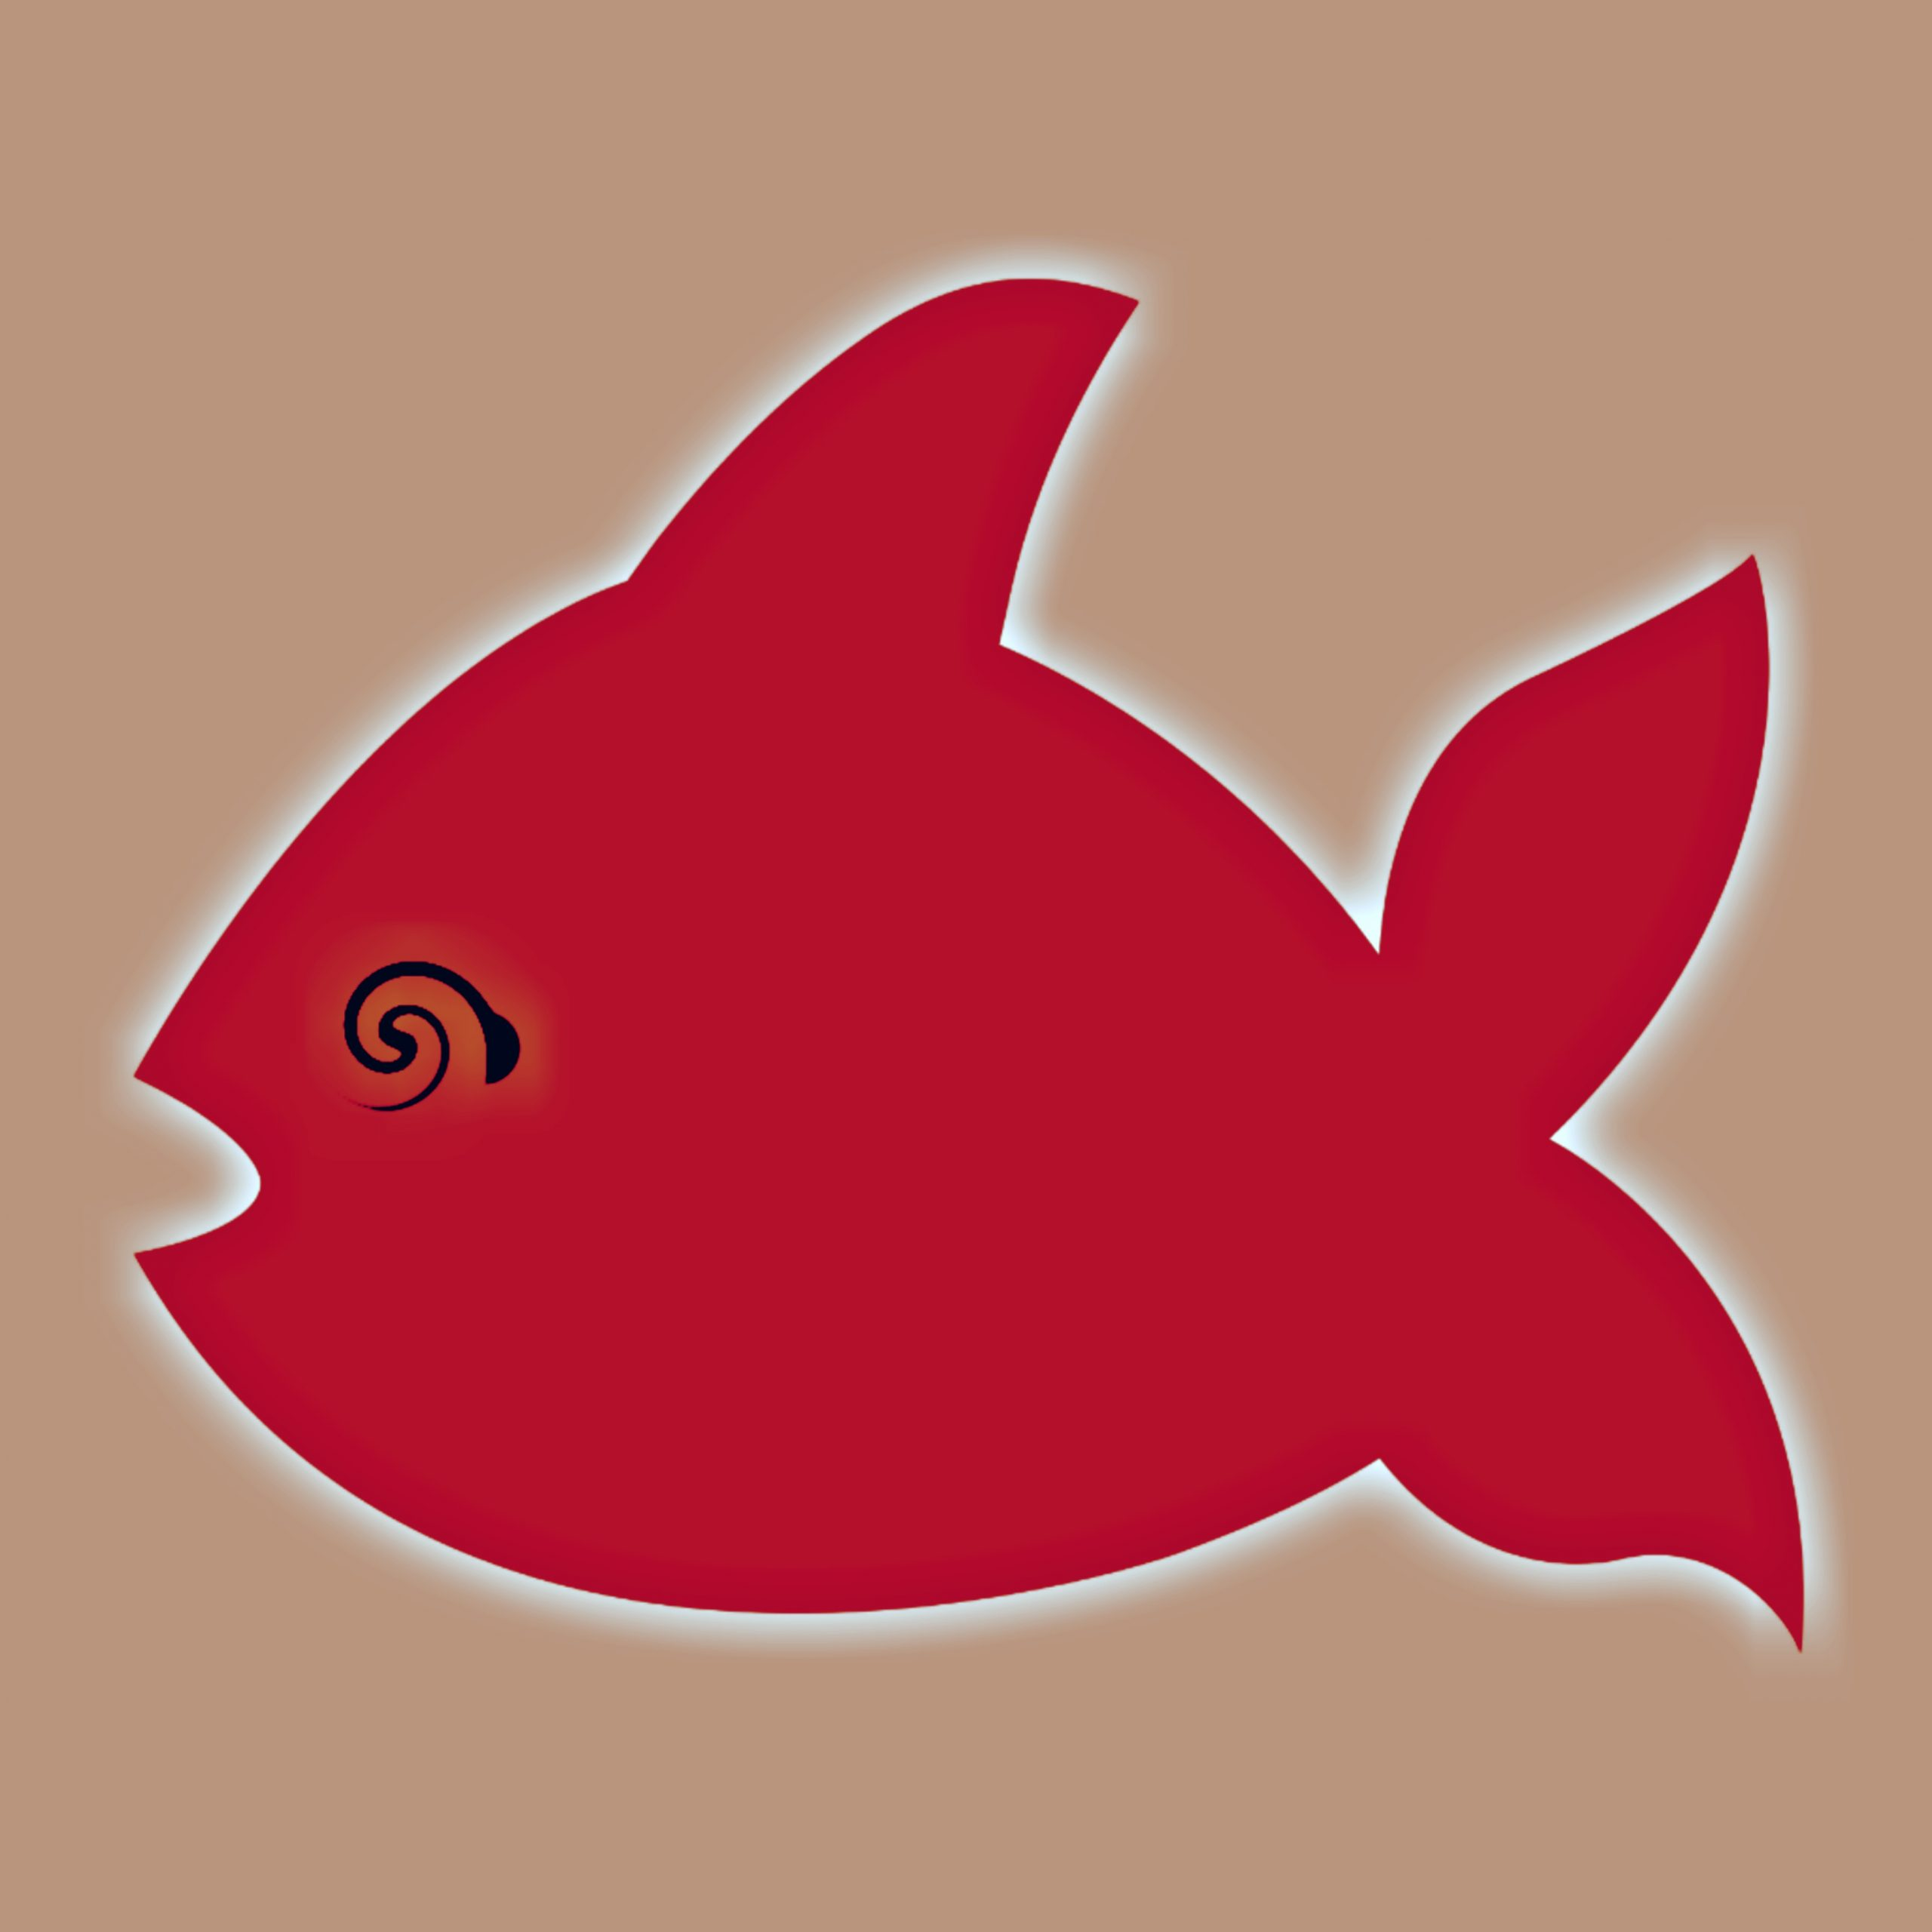 A fish illustration